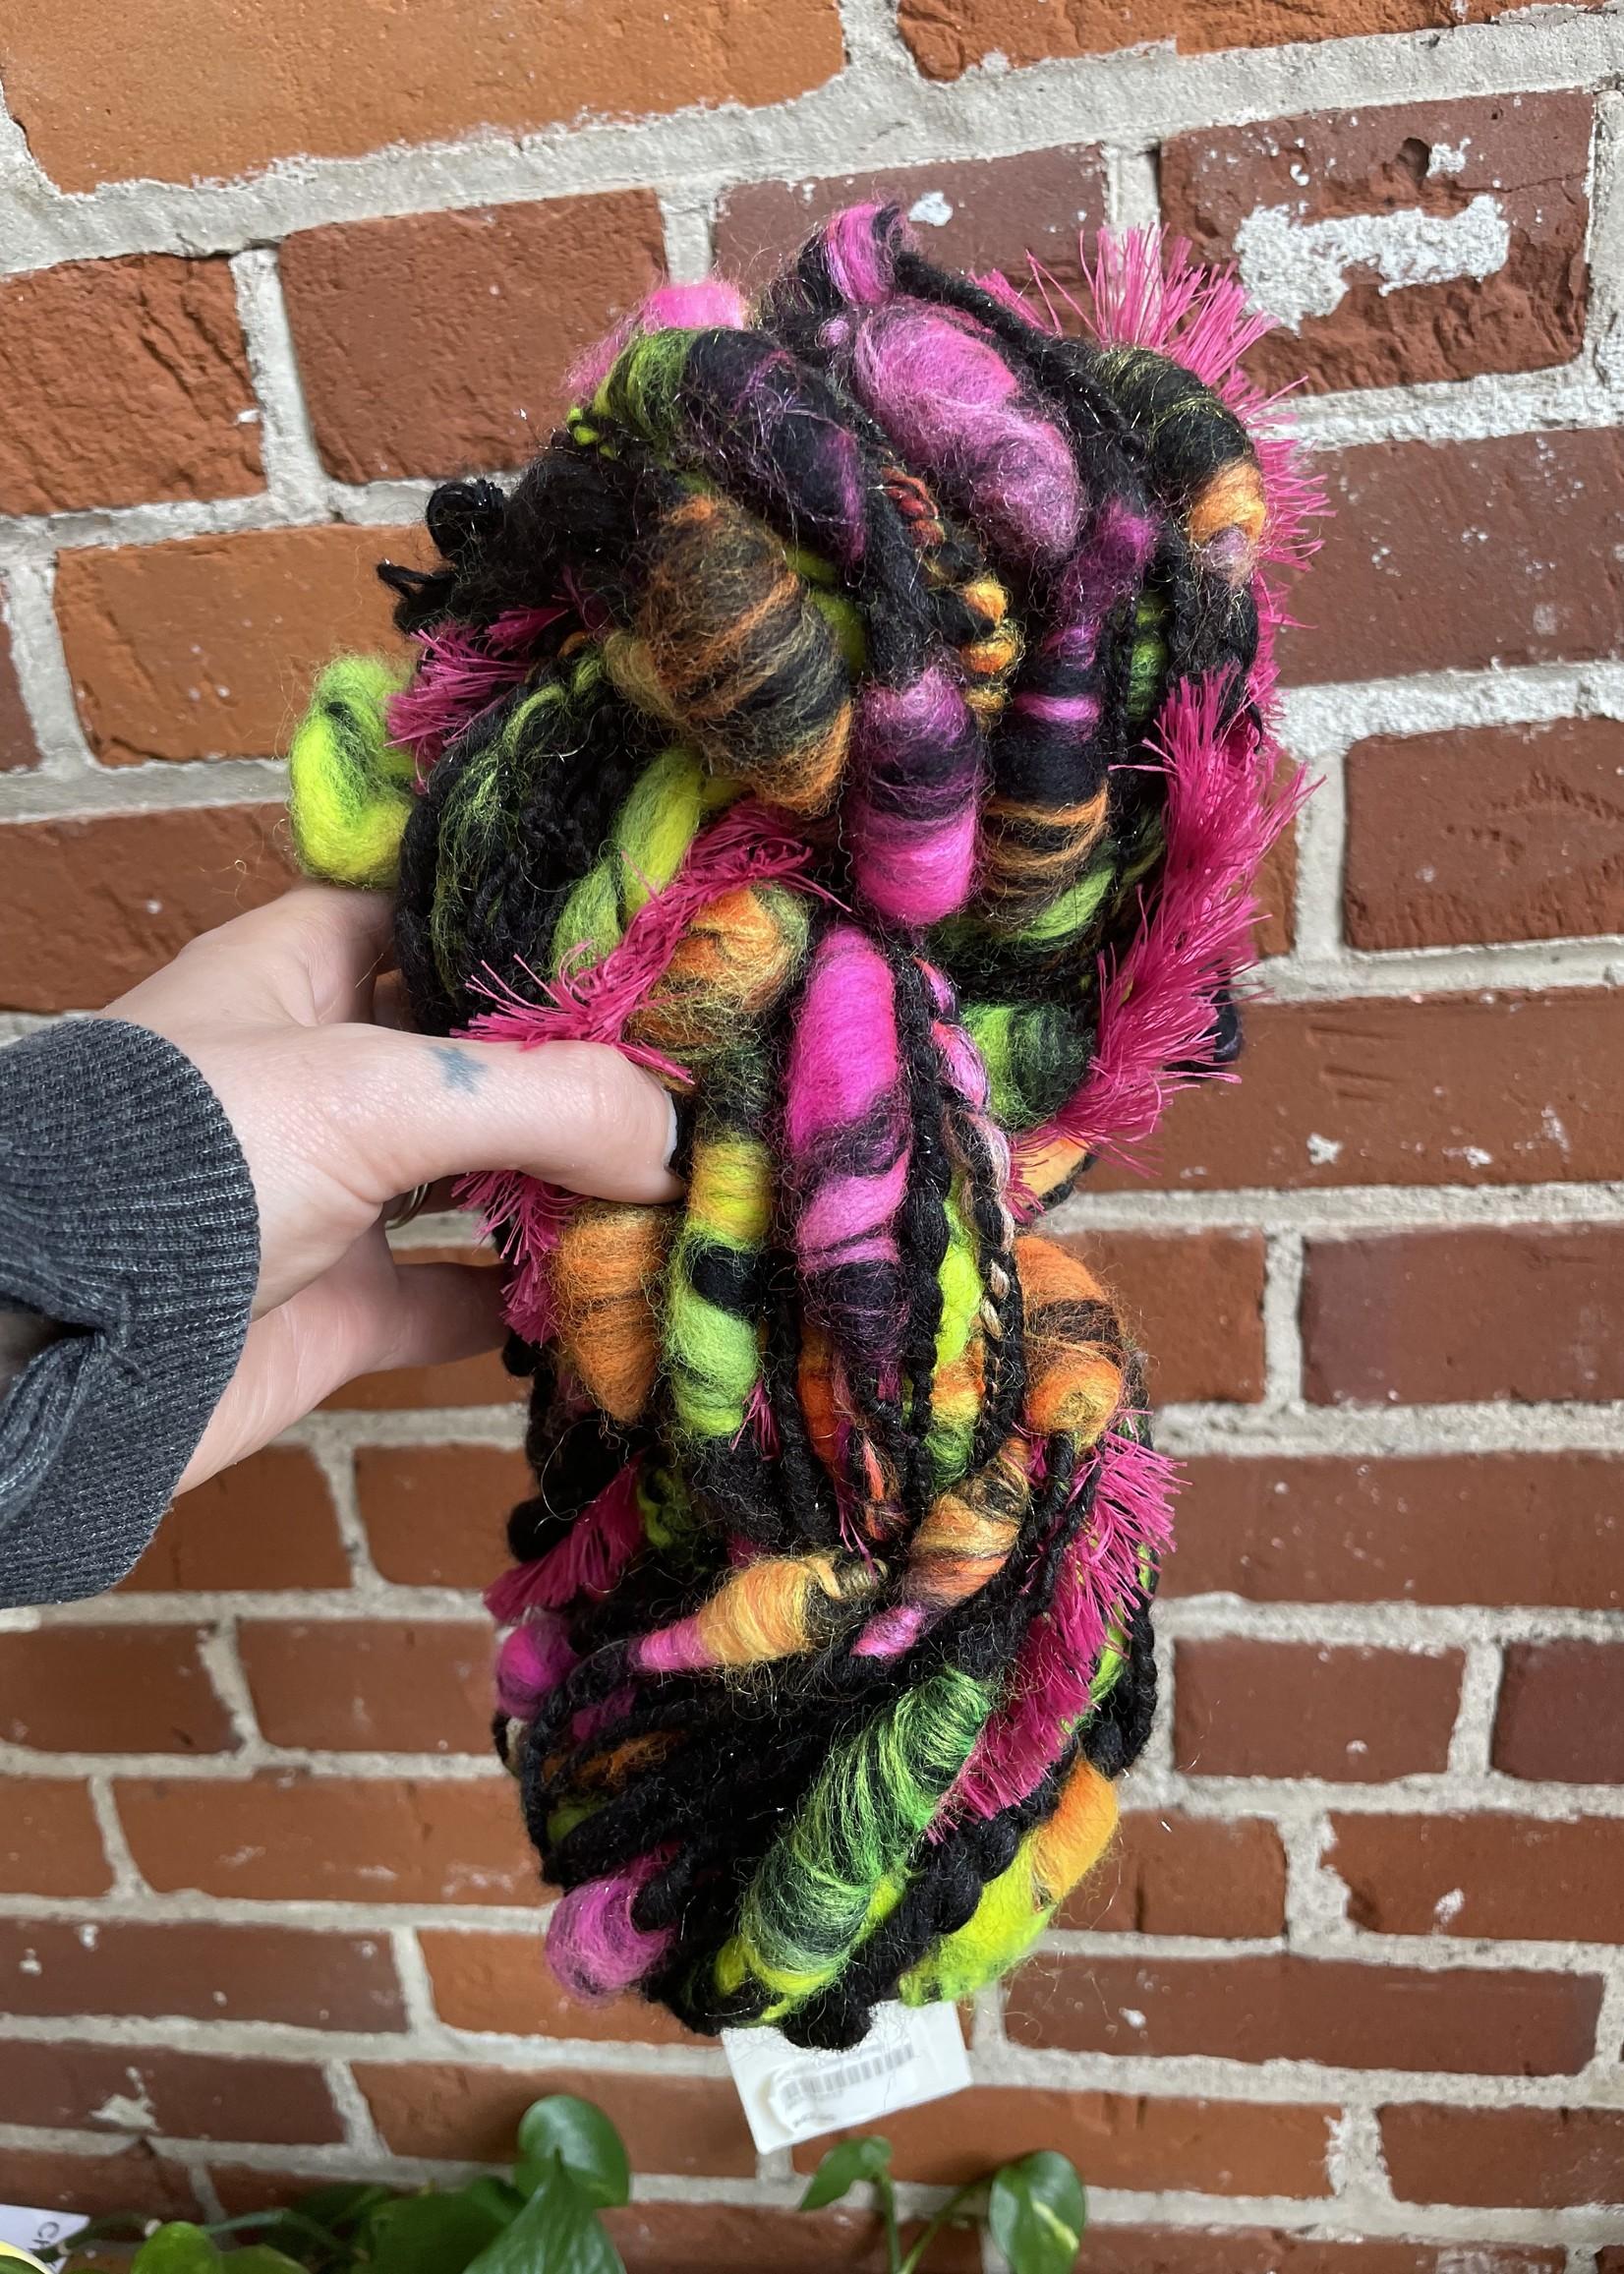 Ruby Slippers Studio Neon Slub Art Yarn